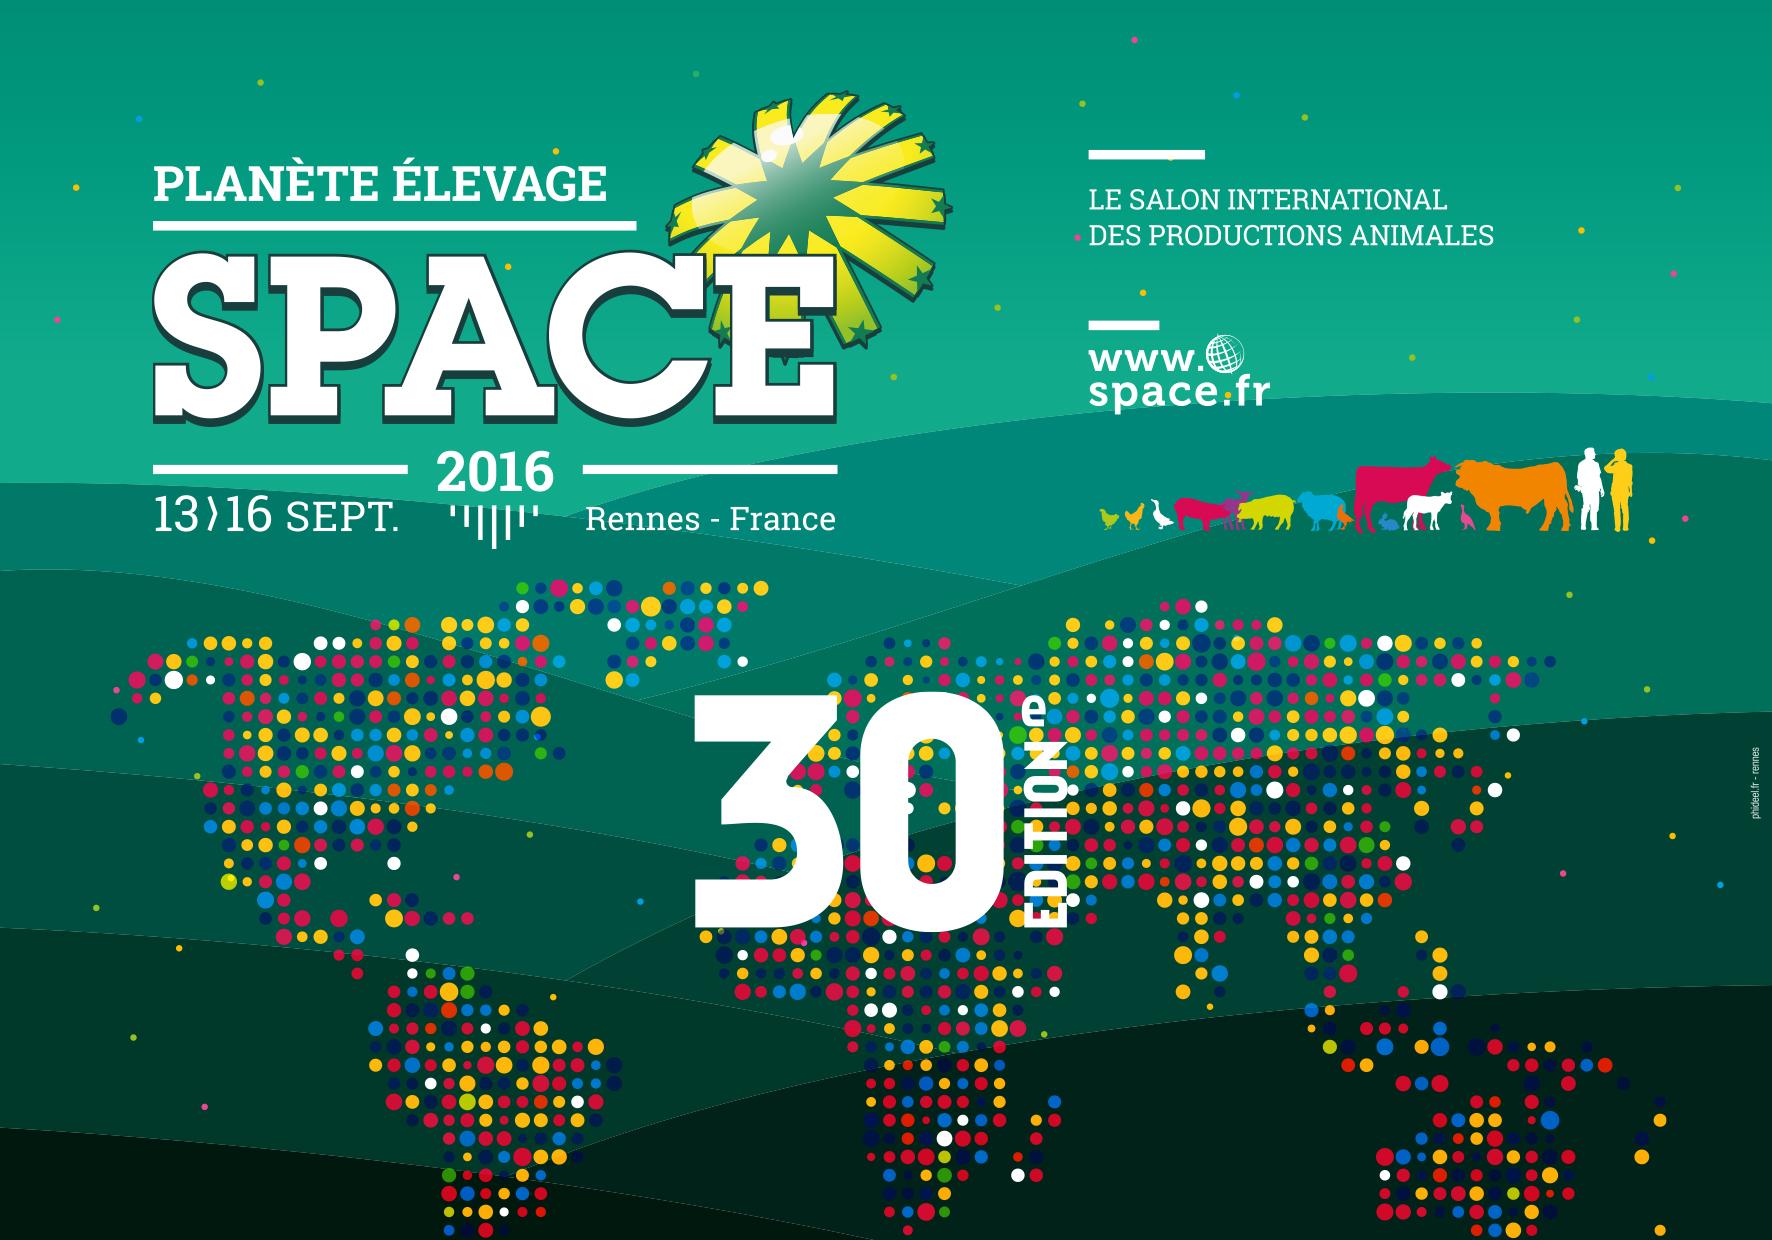 SPACE2016-150x105-FR